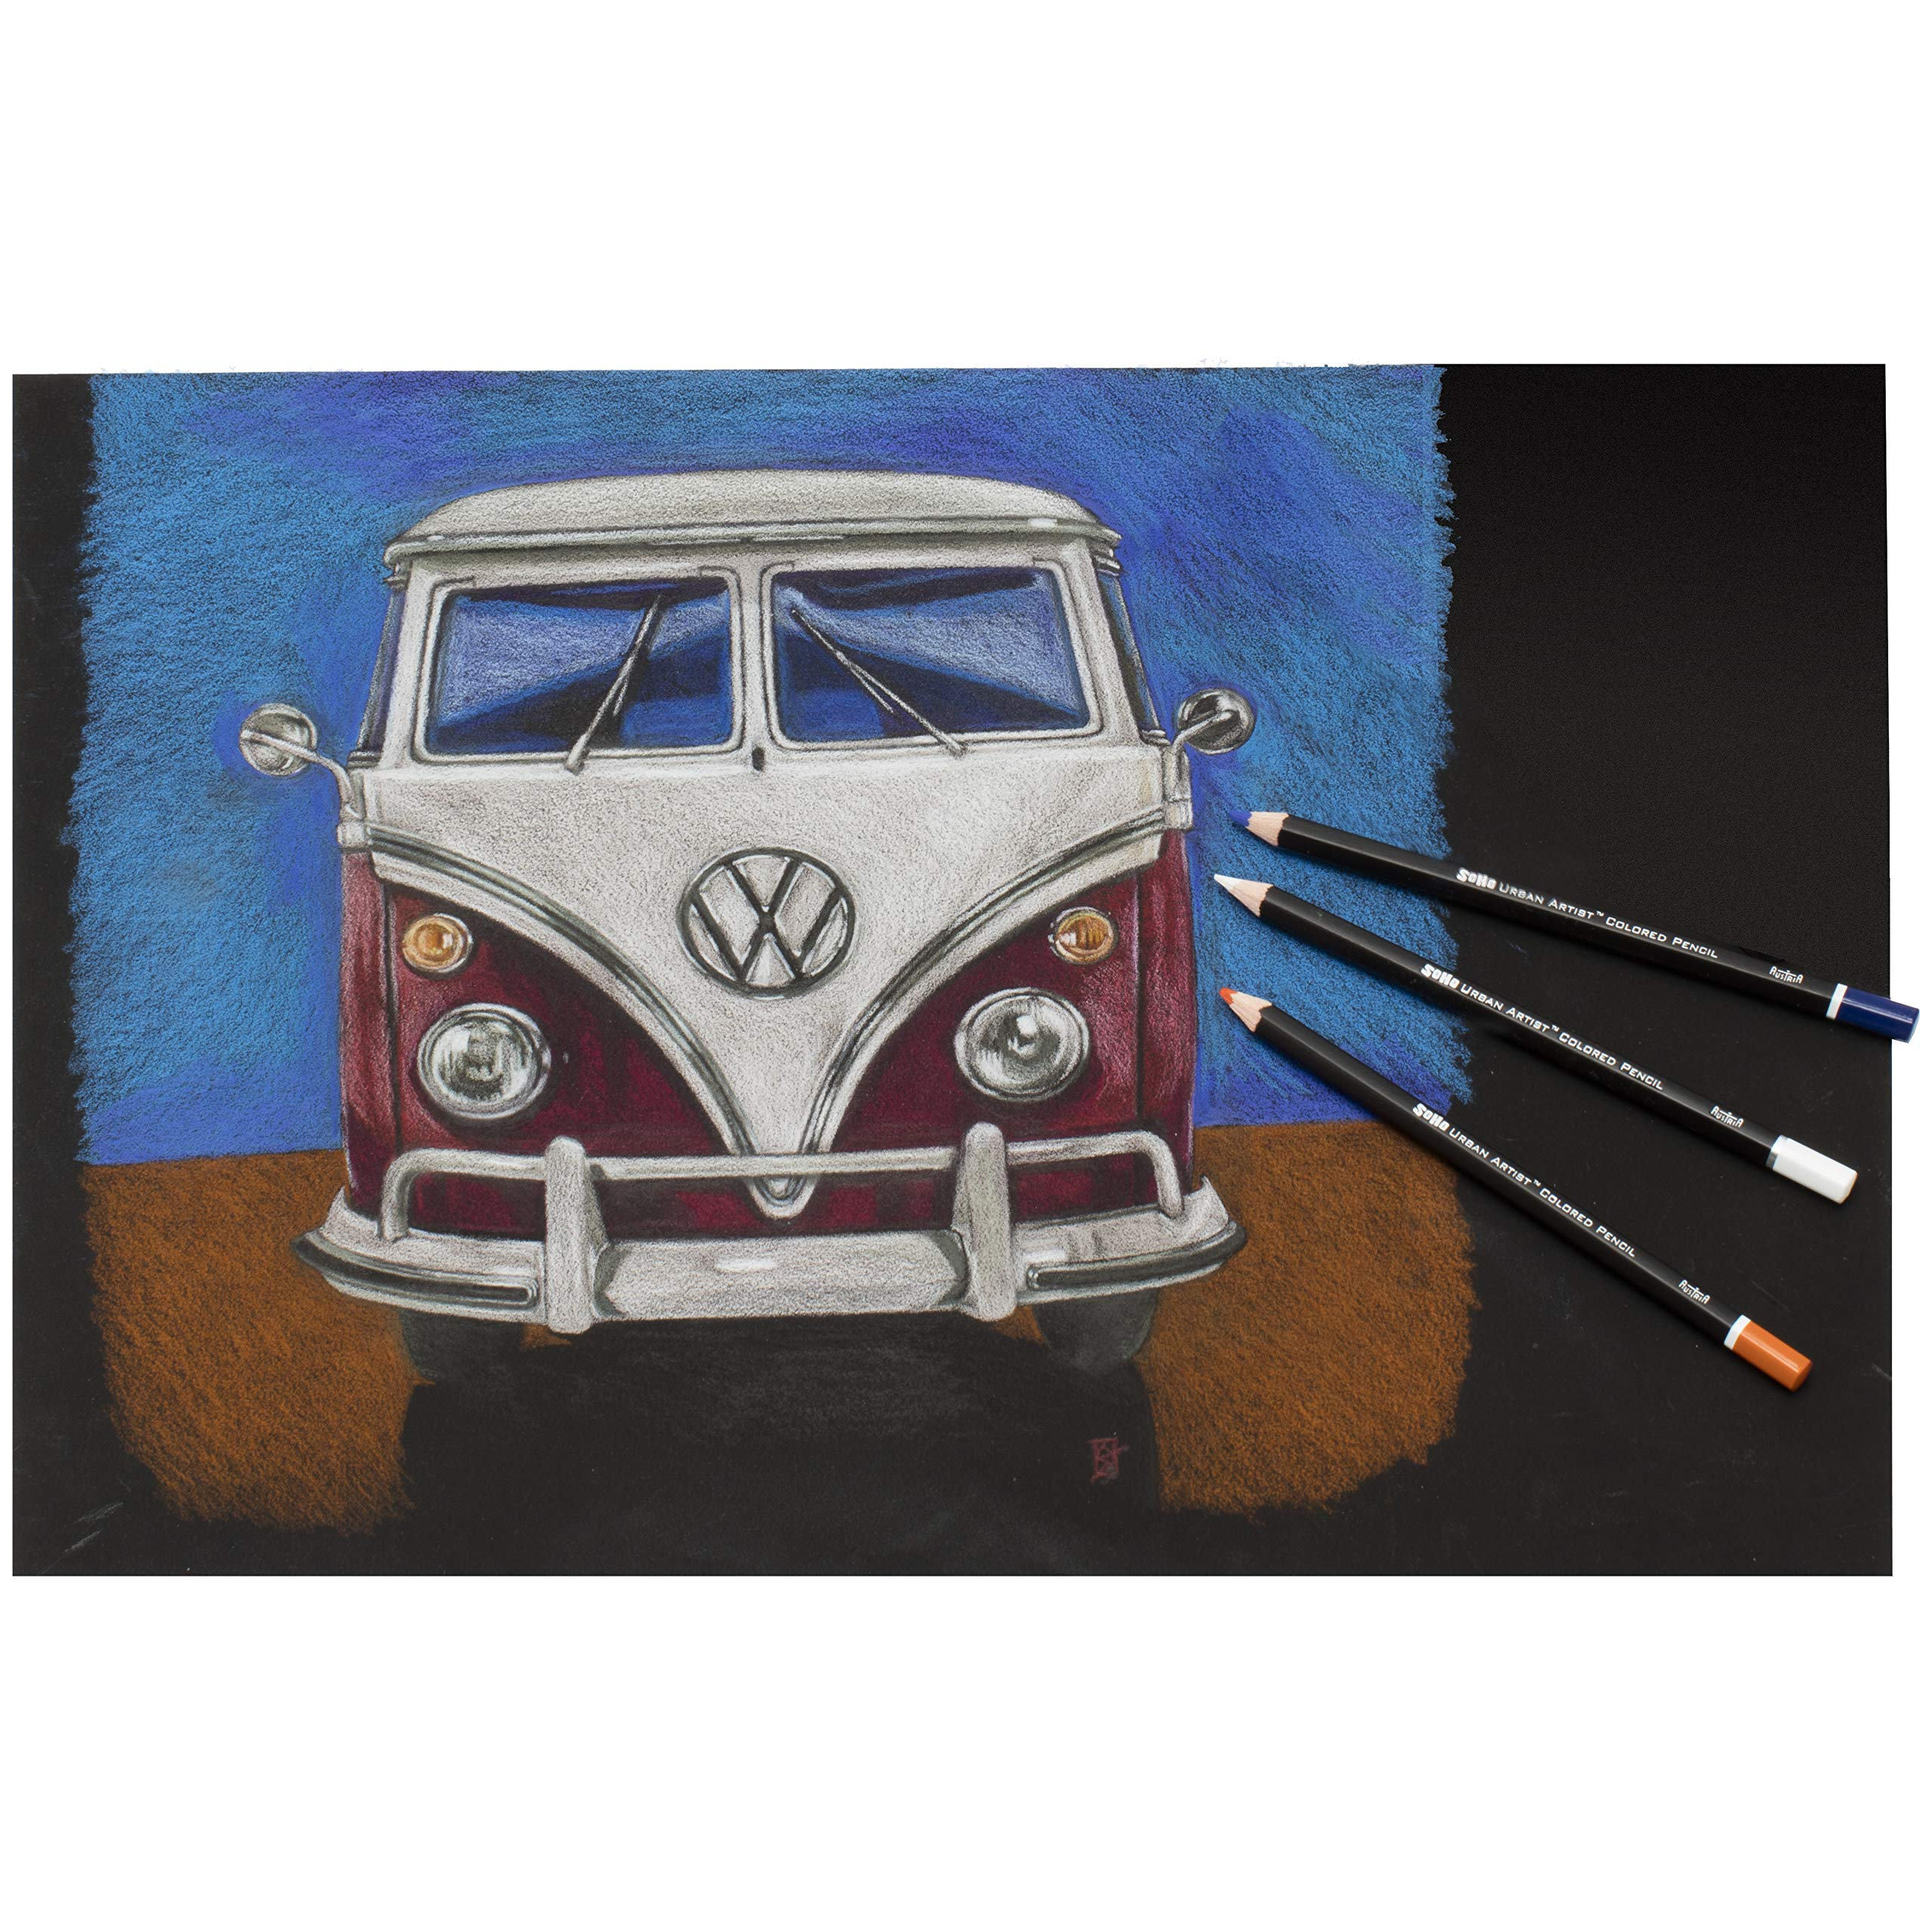 SoHo Urban Artist Professional Colored Pencil Set of 72 - Assorted Colors by Soho Urban Artist (Image #1)